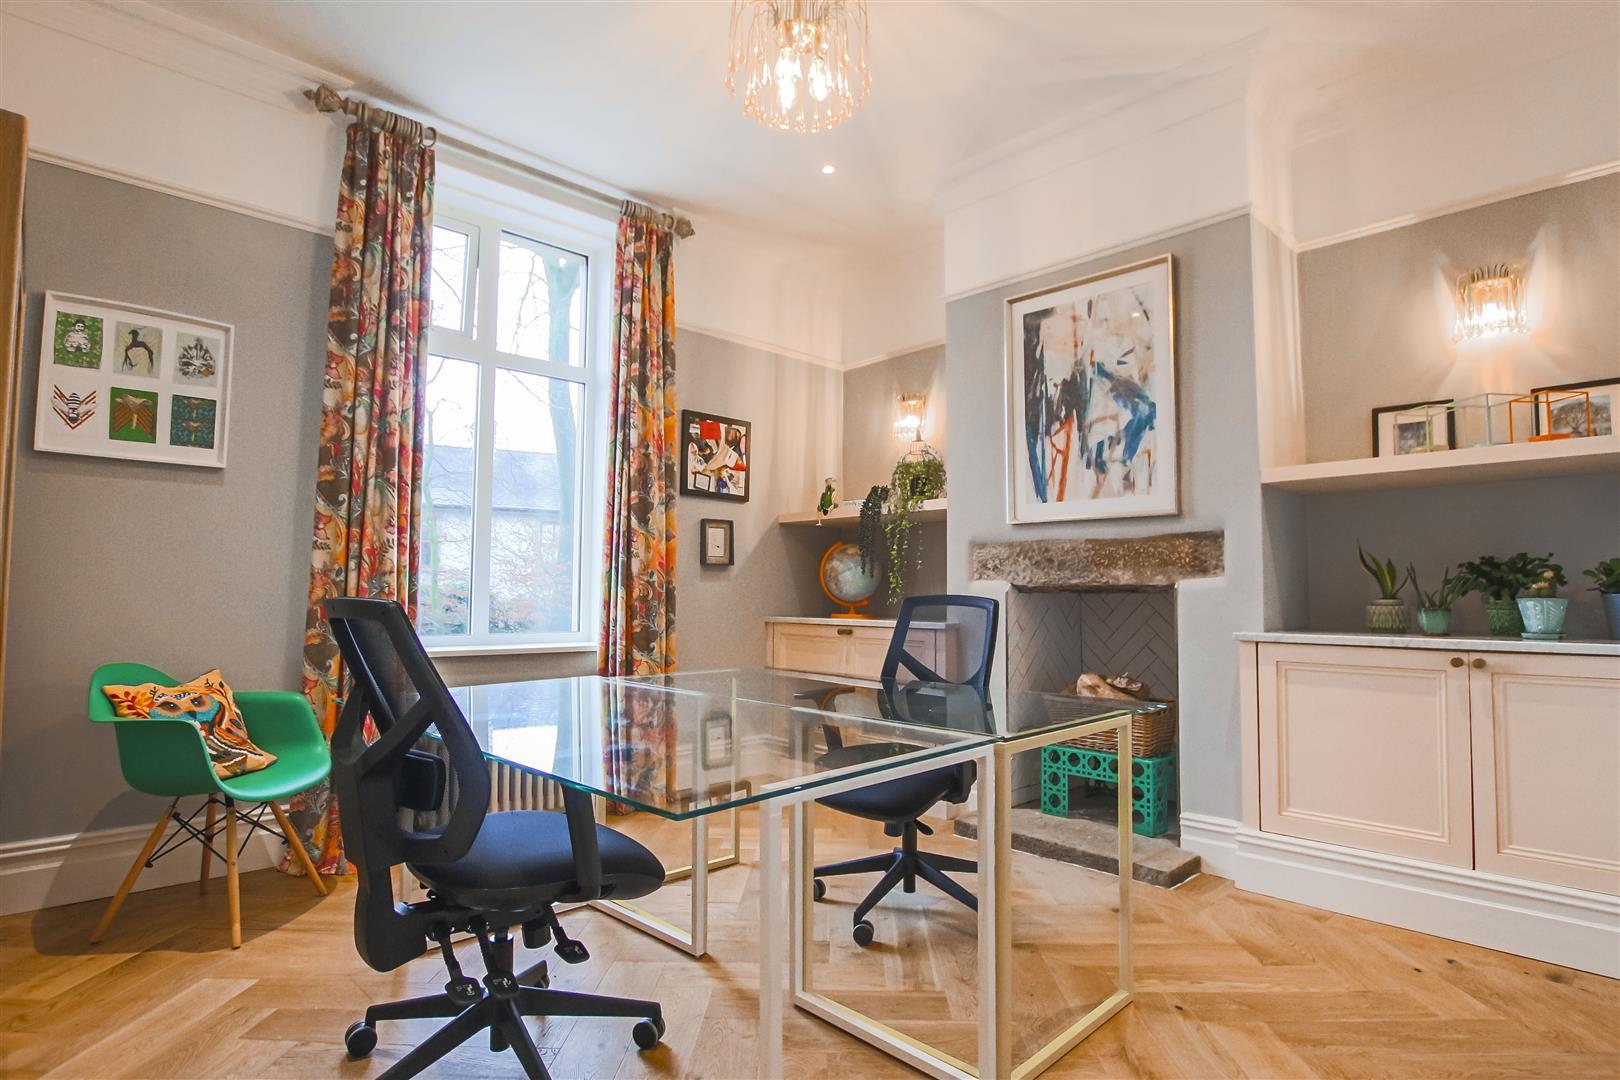 5 Bedroom Detached House For Sale - Office / Reception Room 2